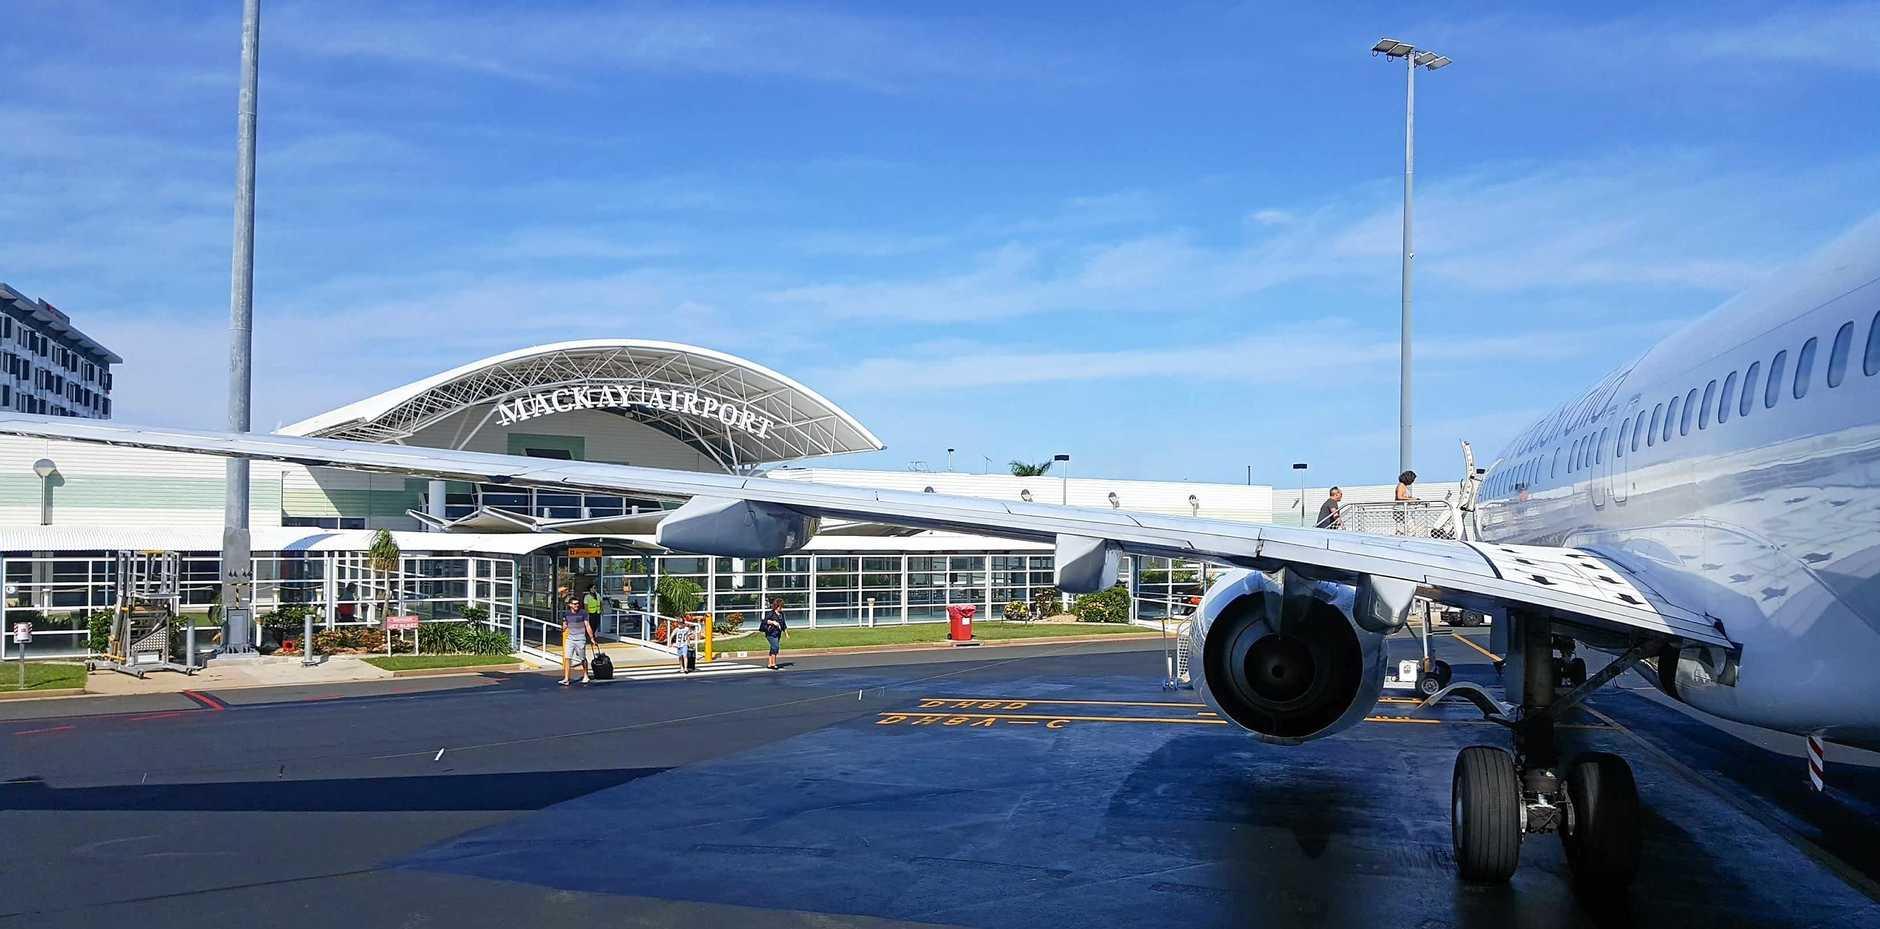 Jetstar is offering $49 flights from Mackay to Brisbane.